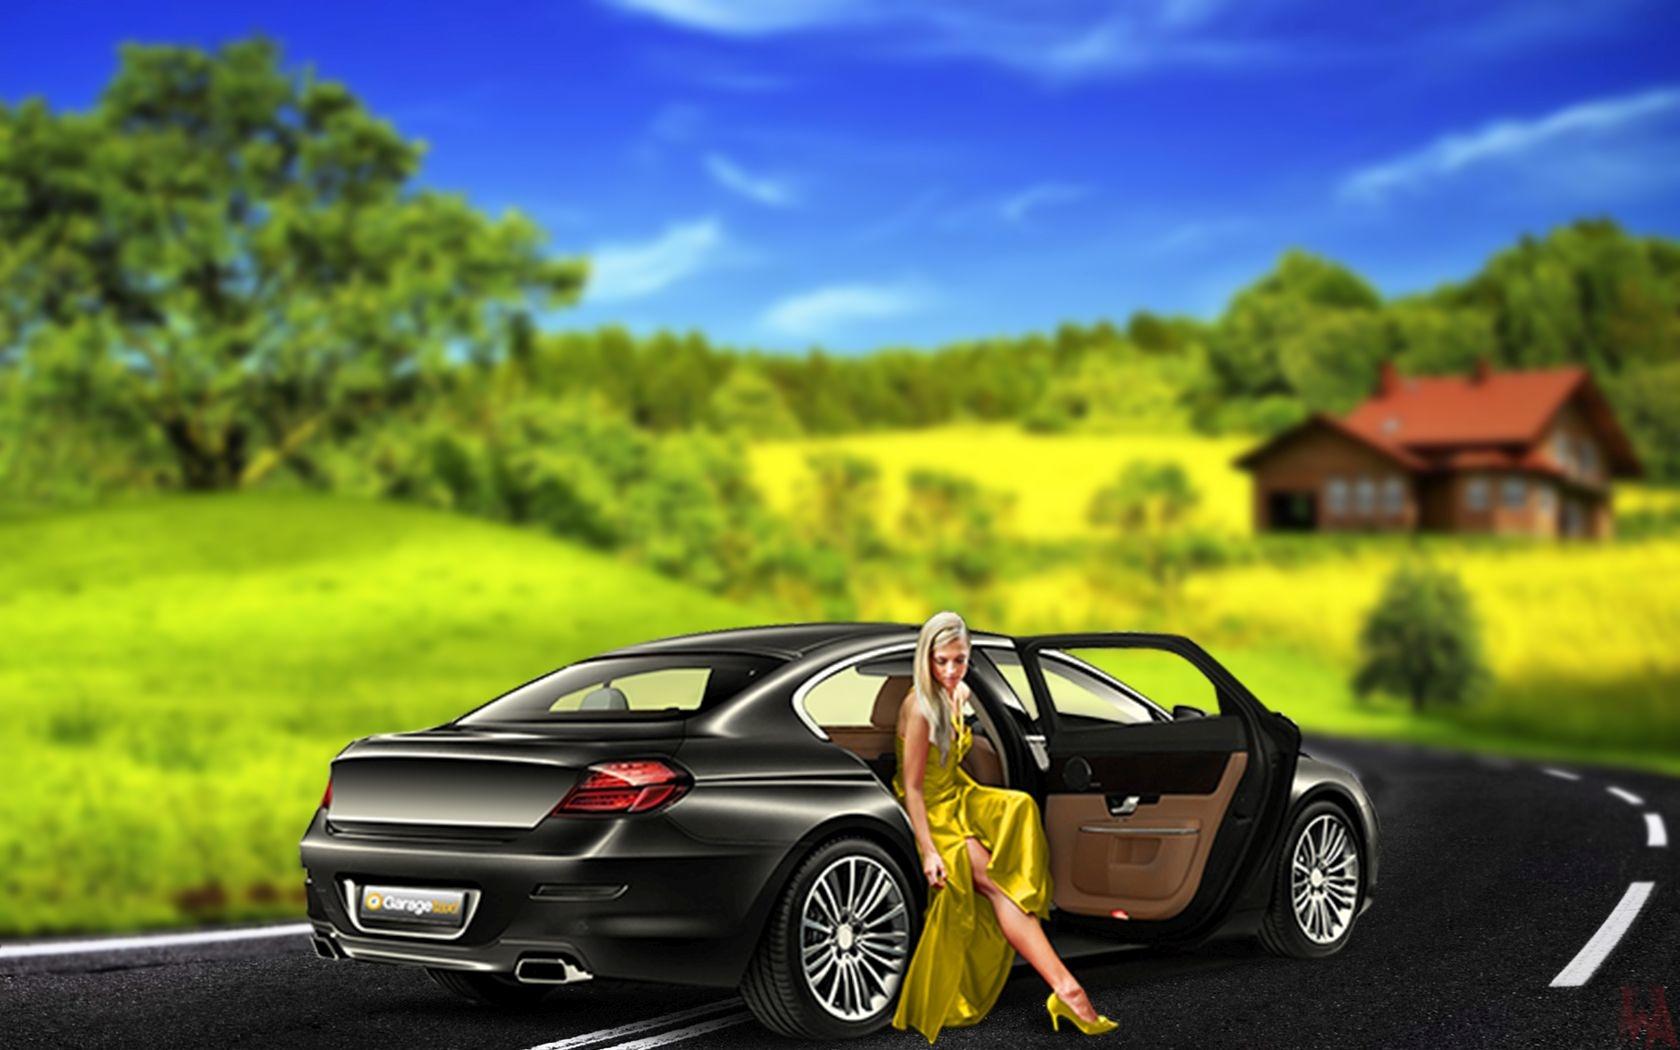 Black car with beautiful girl wallpaper